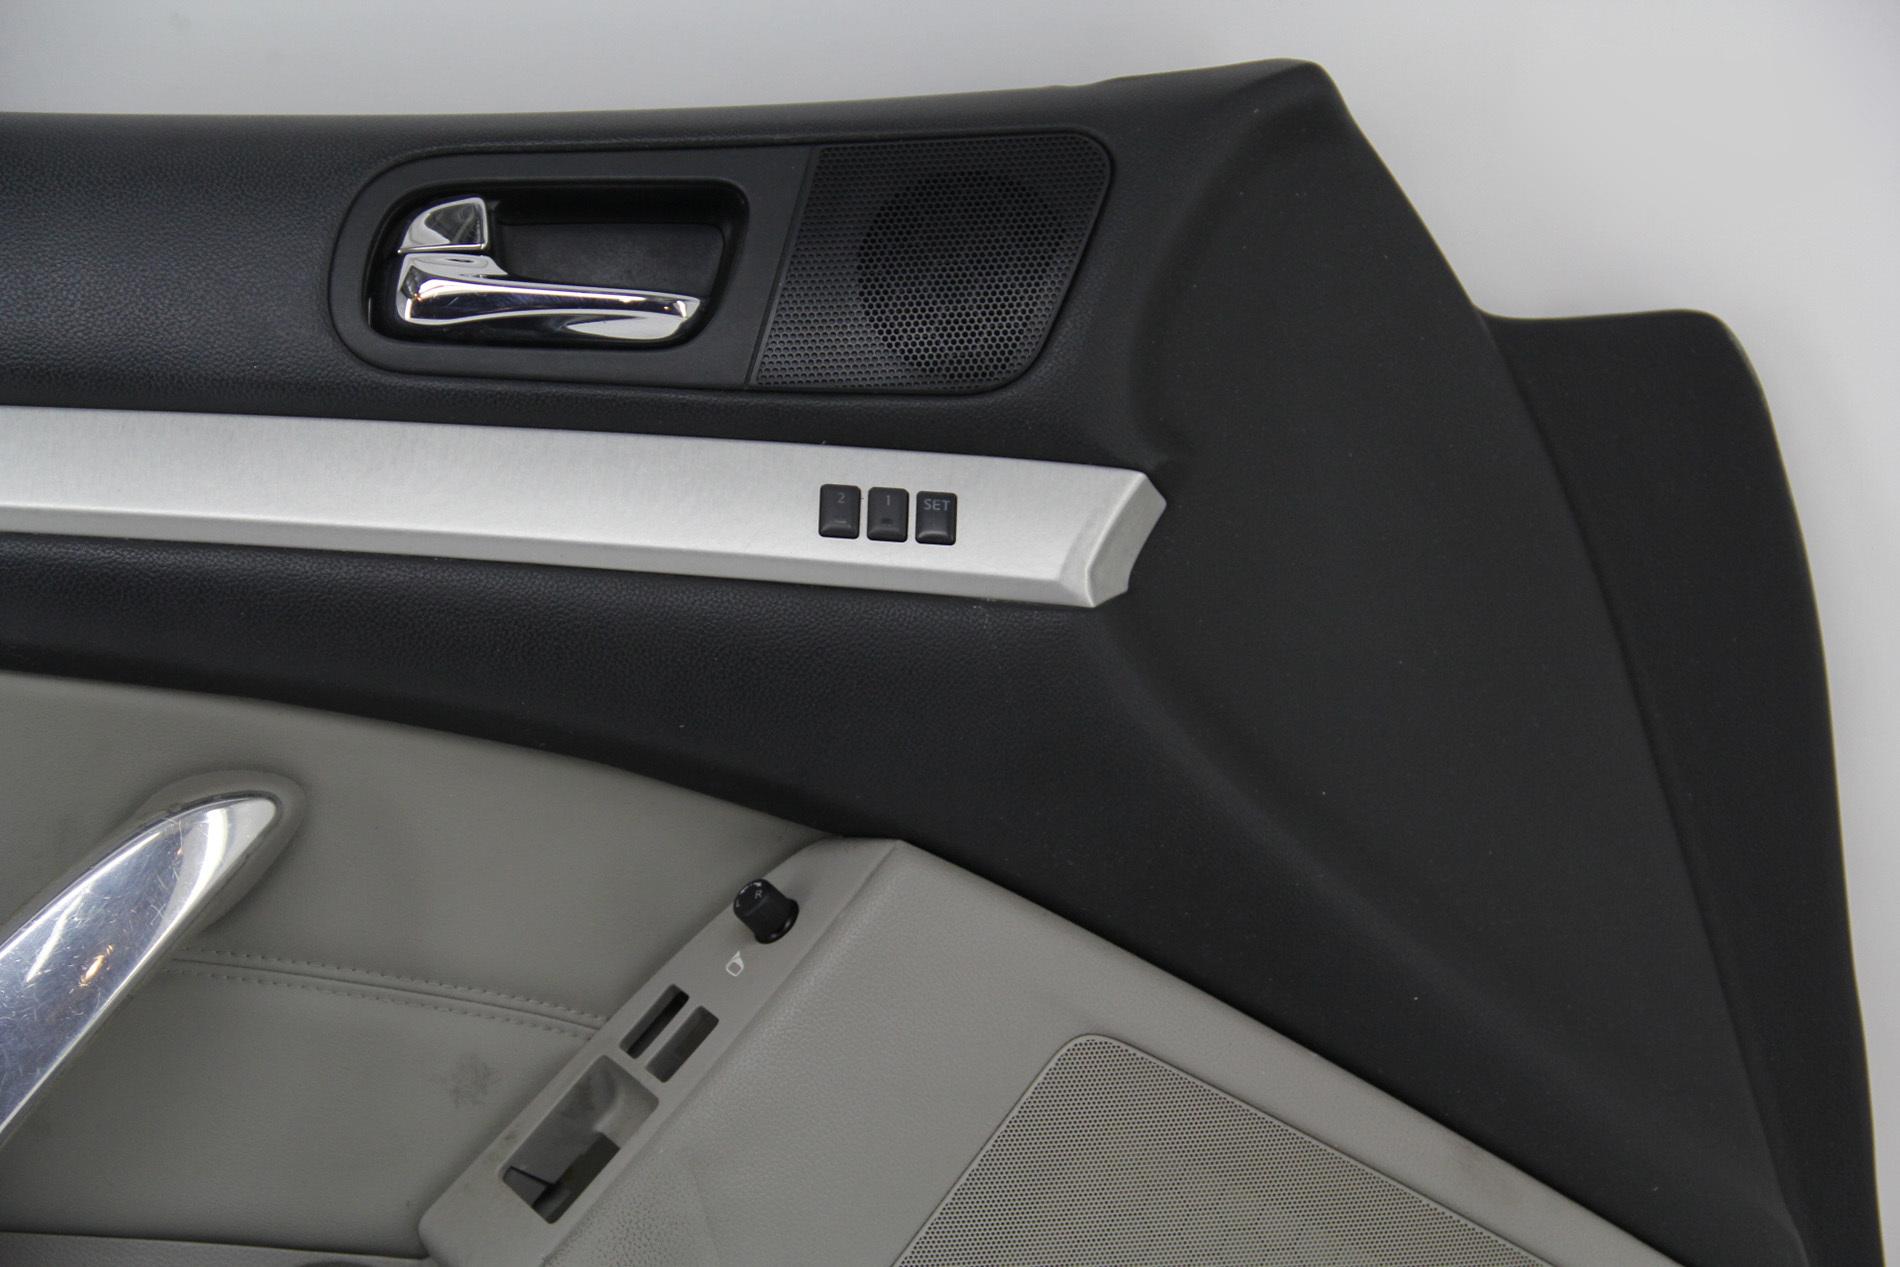 Infiniti G37 Coupe 08 13 Front Left Driver Door Panel Black Gray 80901 Jl34c Oem Extreme Auto Parts